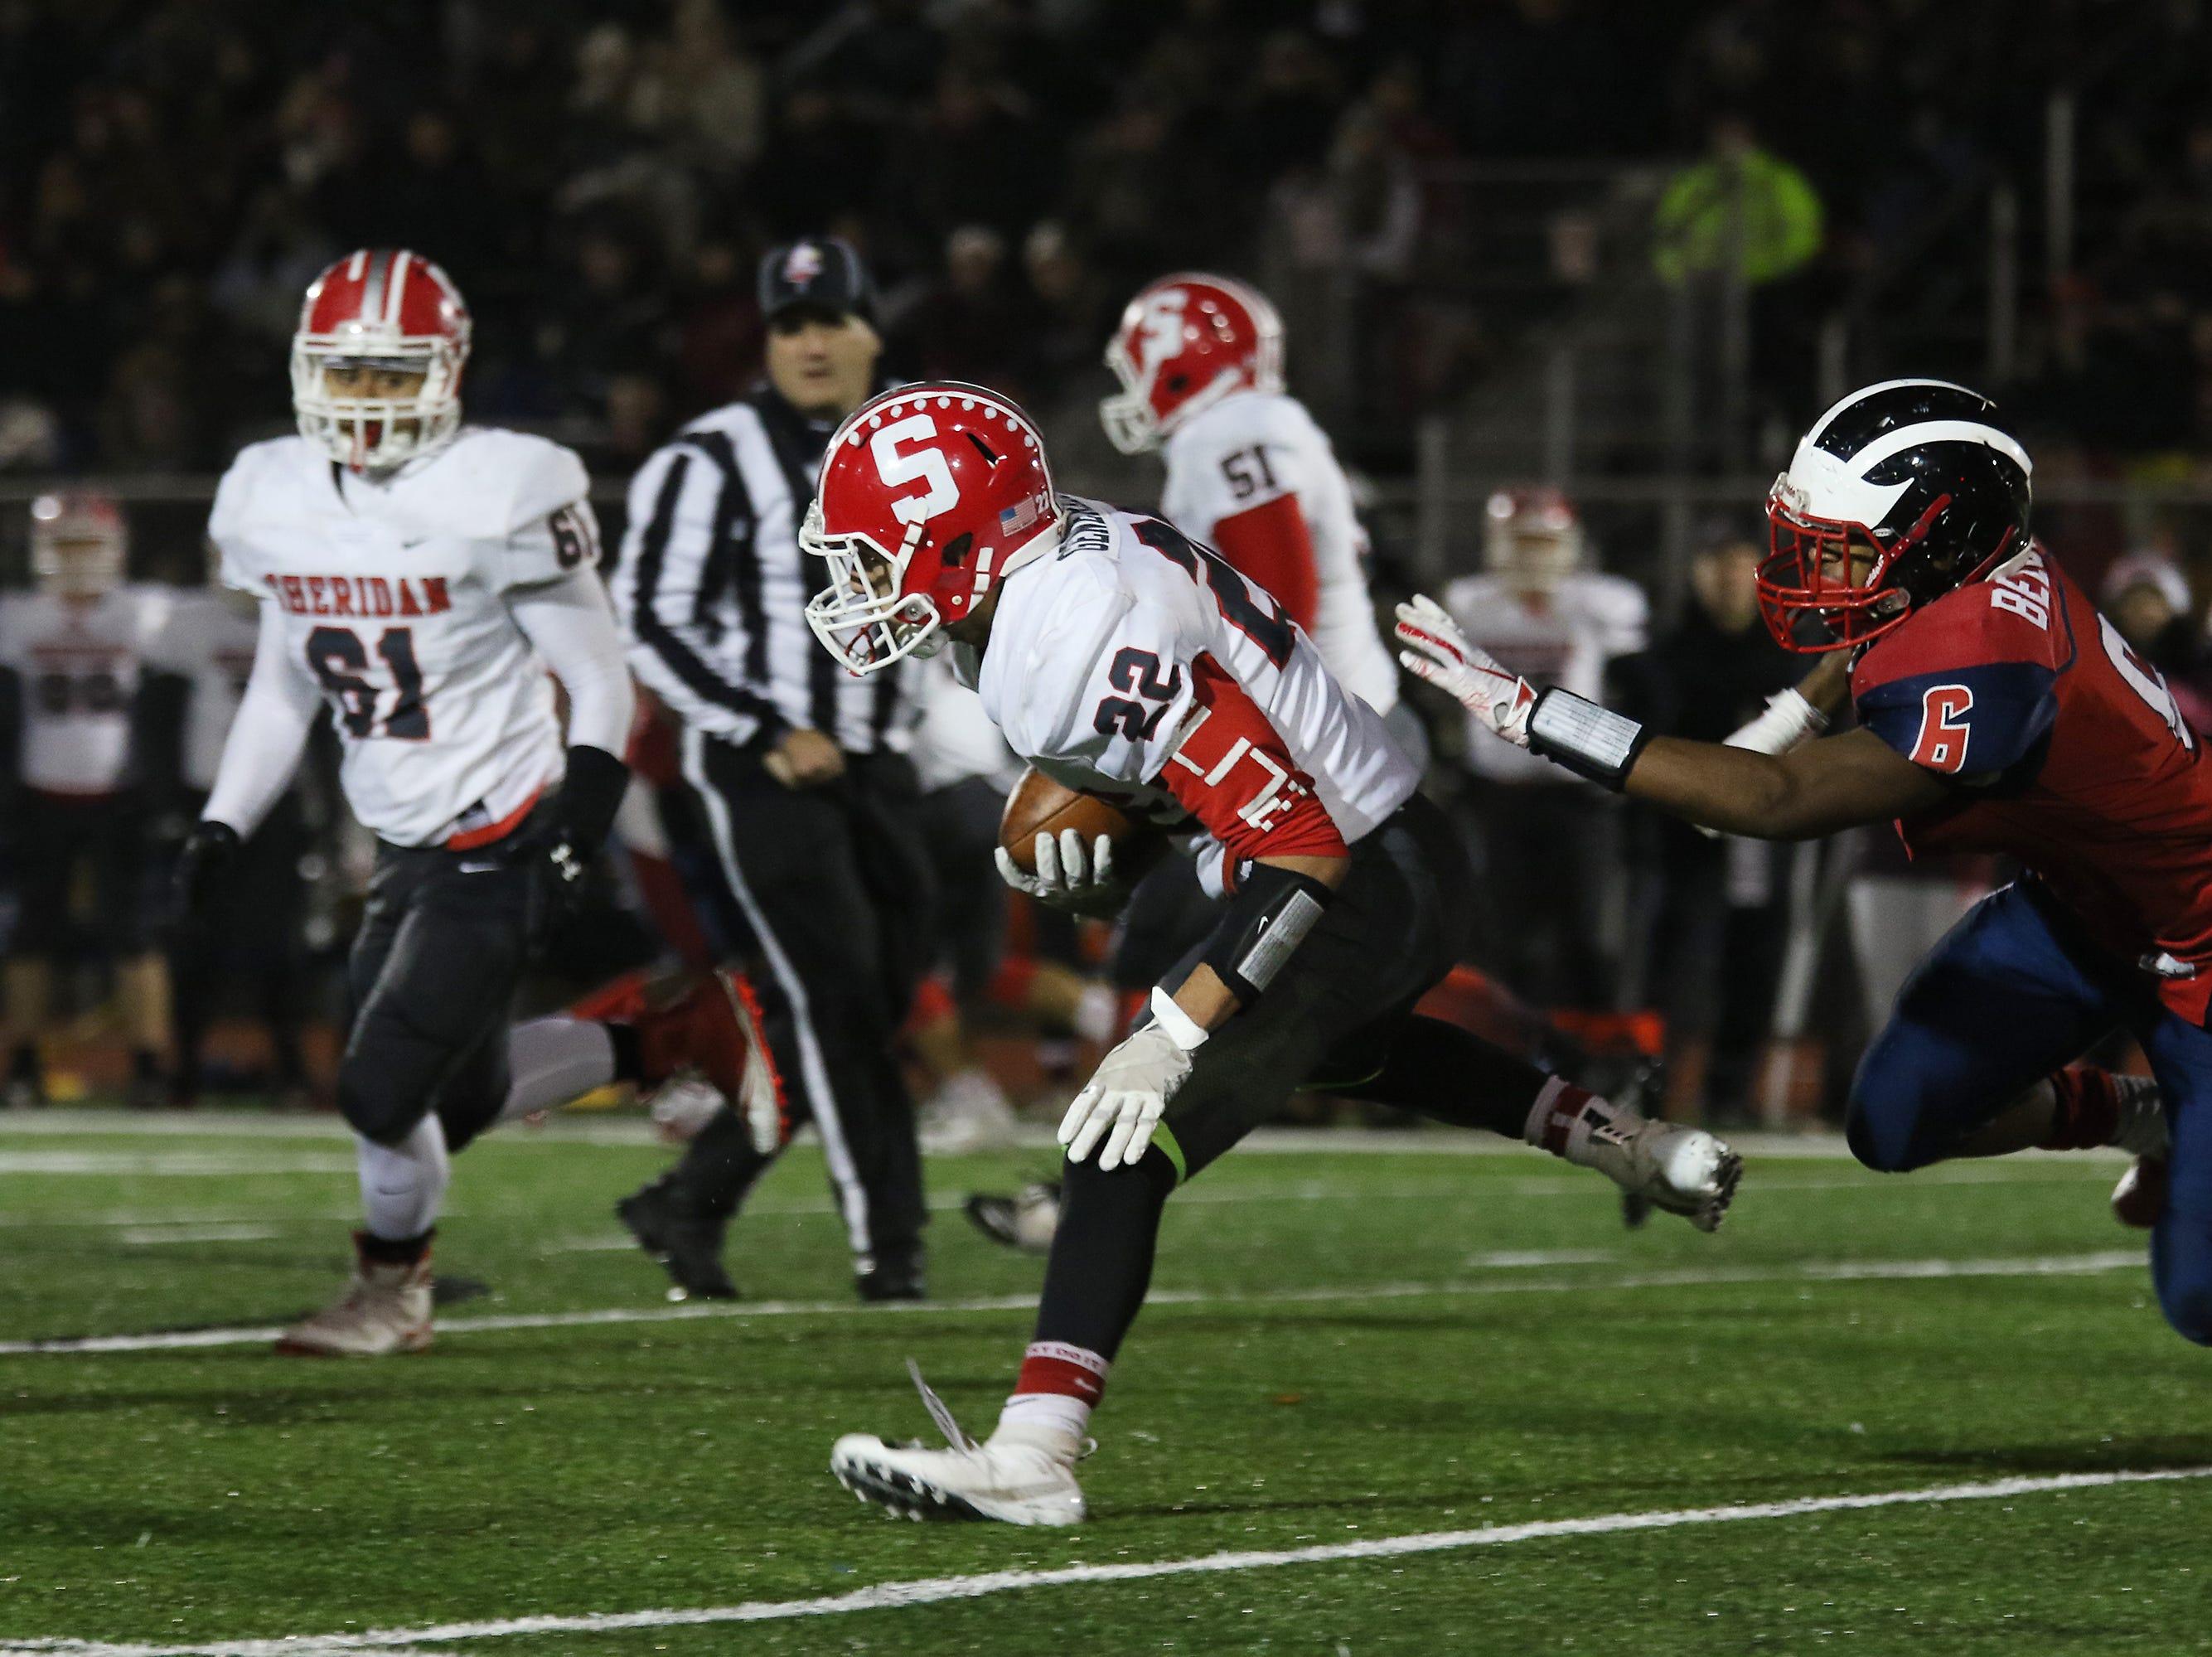 Sheridan's Isaiah Austin carries the ball against Eastmoor.